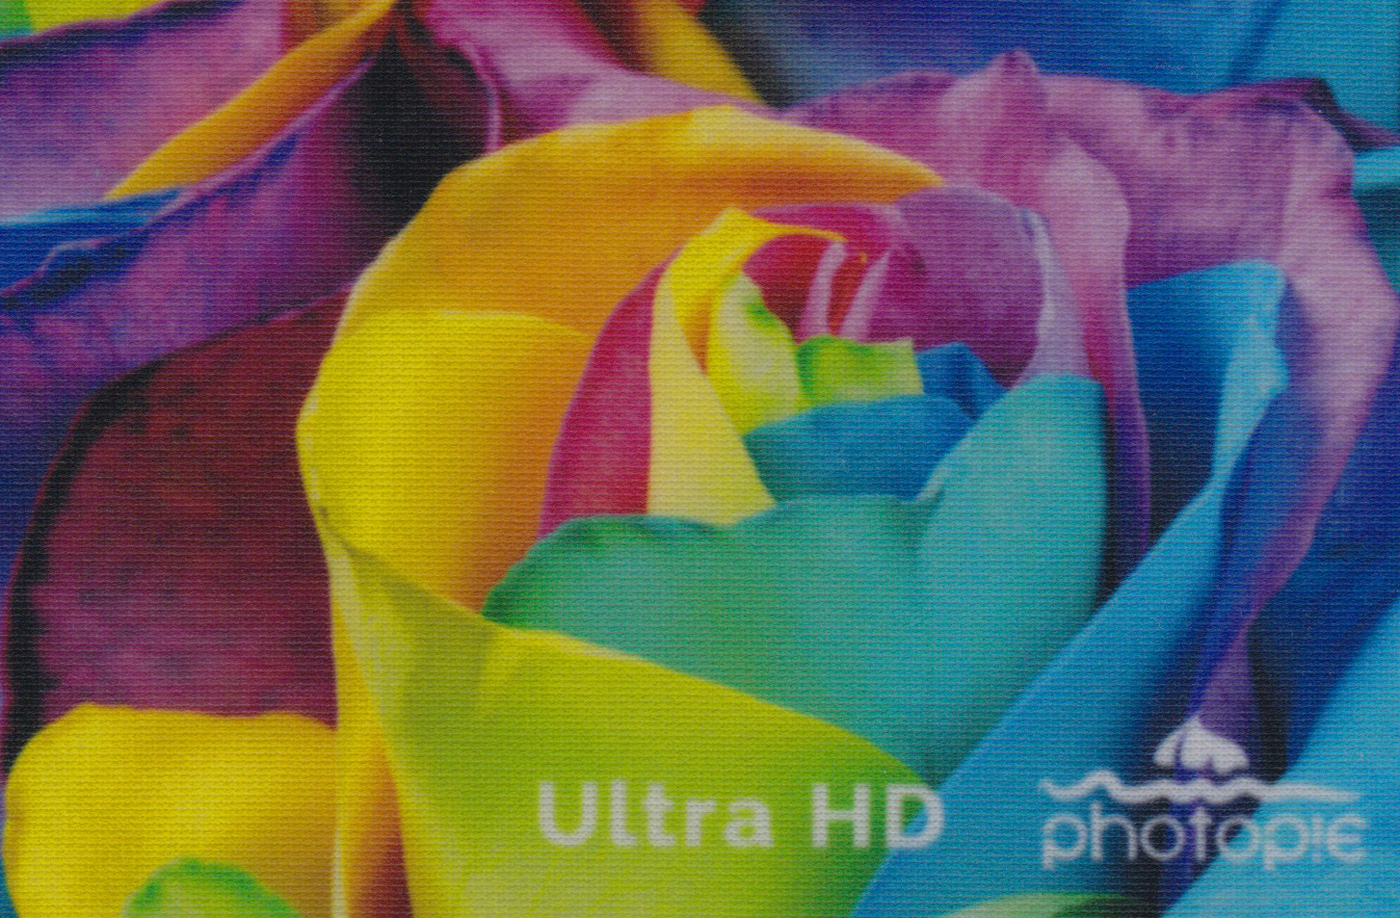 Ultra HD Swatch